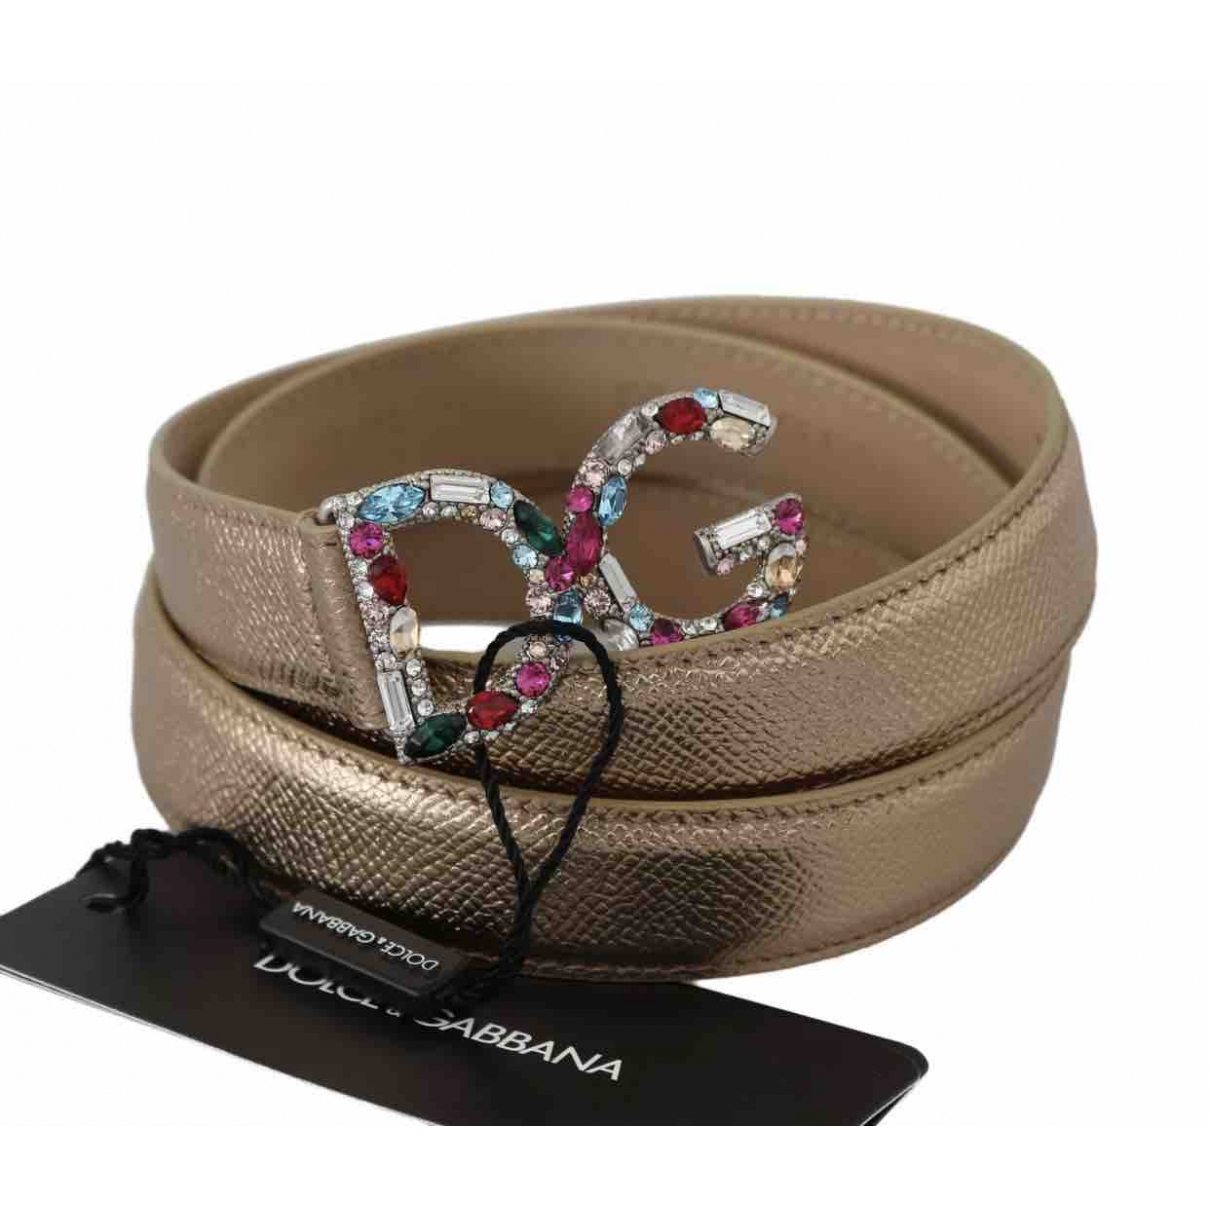 Dolce & Gabbana \N Gold Leather belt for Women 95 cm